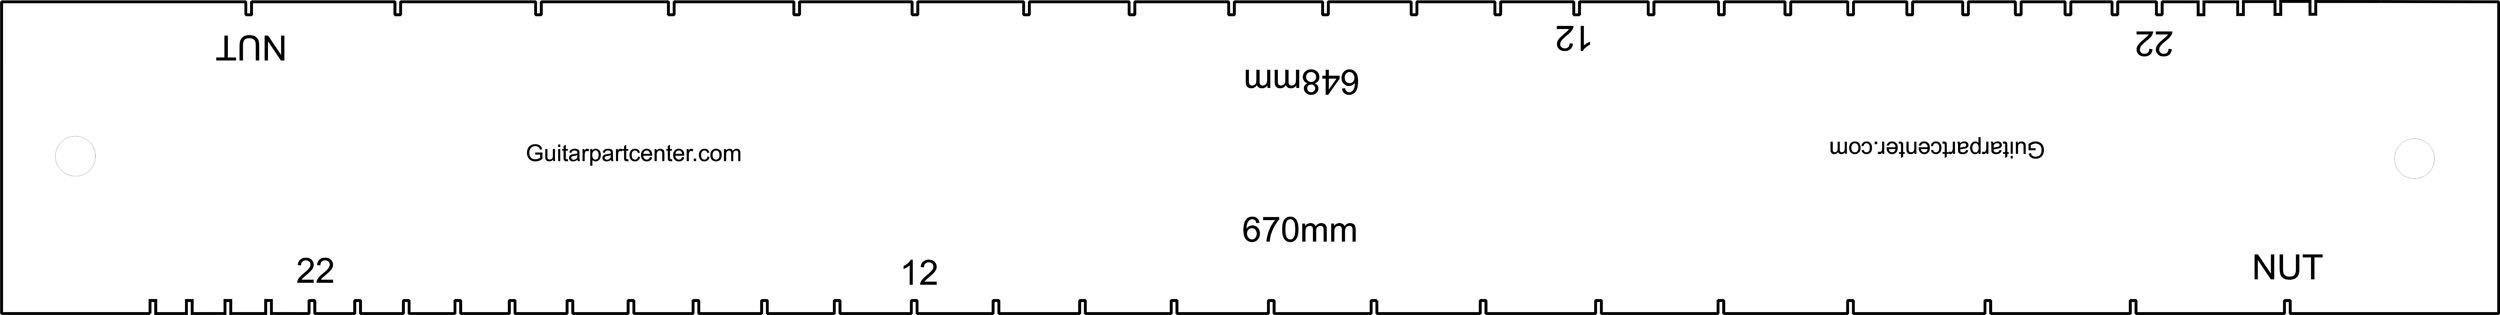 Dual Scal Fingerboard Slotting Template - 648mm & 670mm